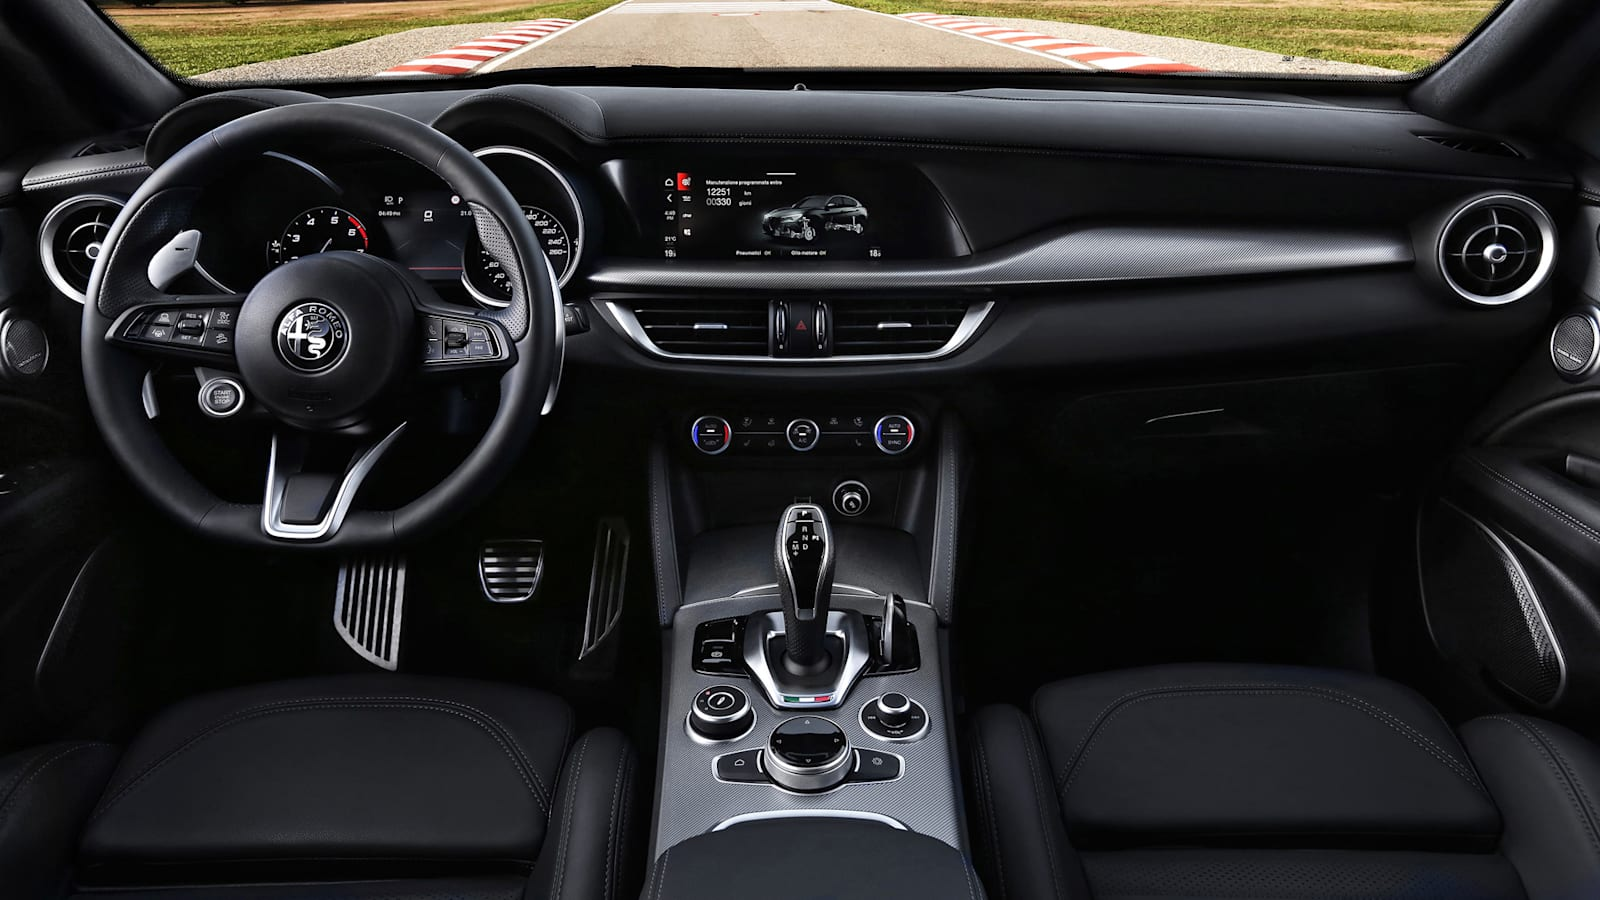 2020 Alfa Romeo Stelvio Reviews Price Specs Features And Photos Autoblog